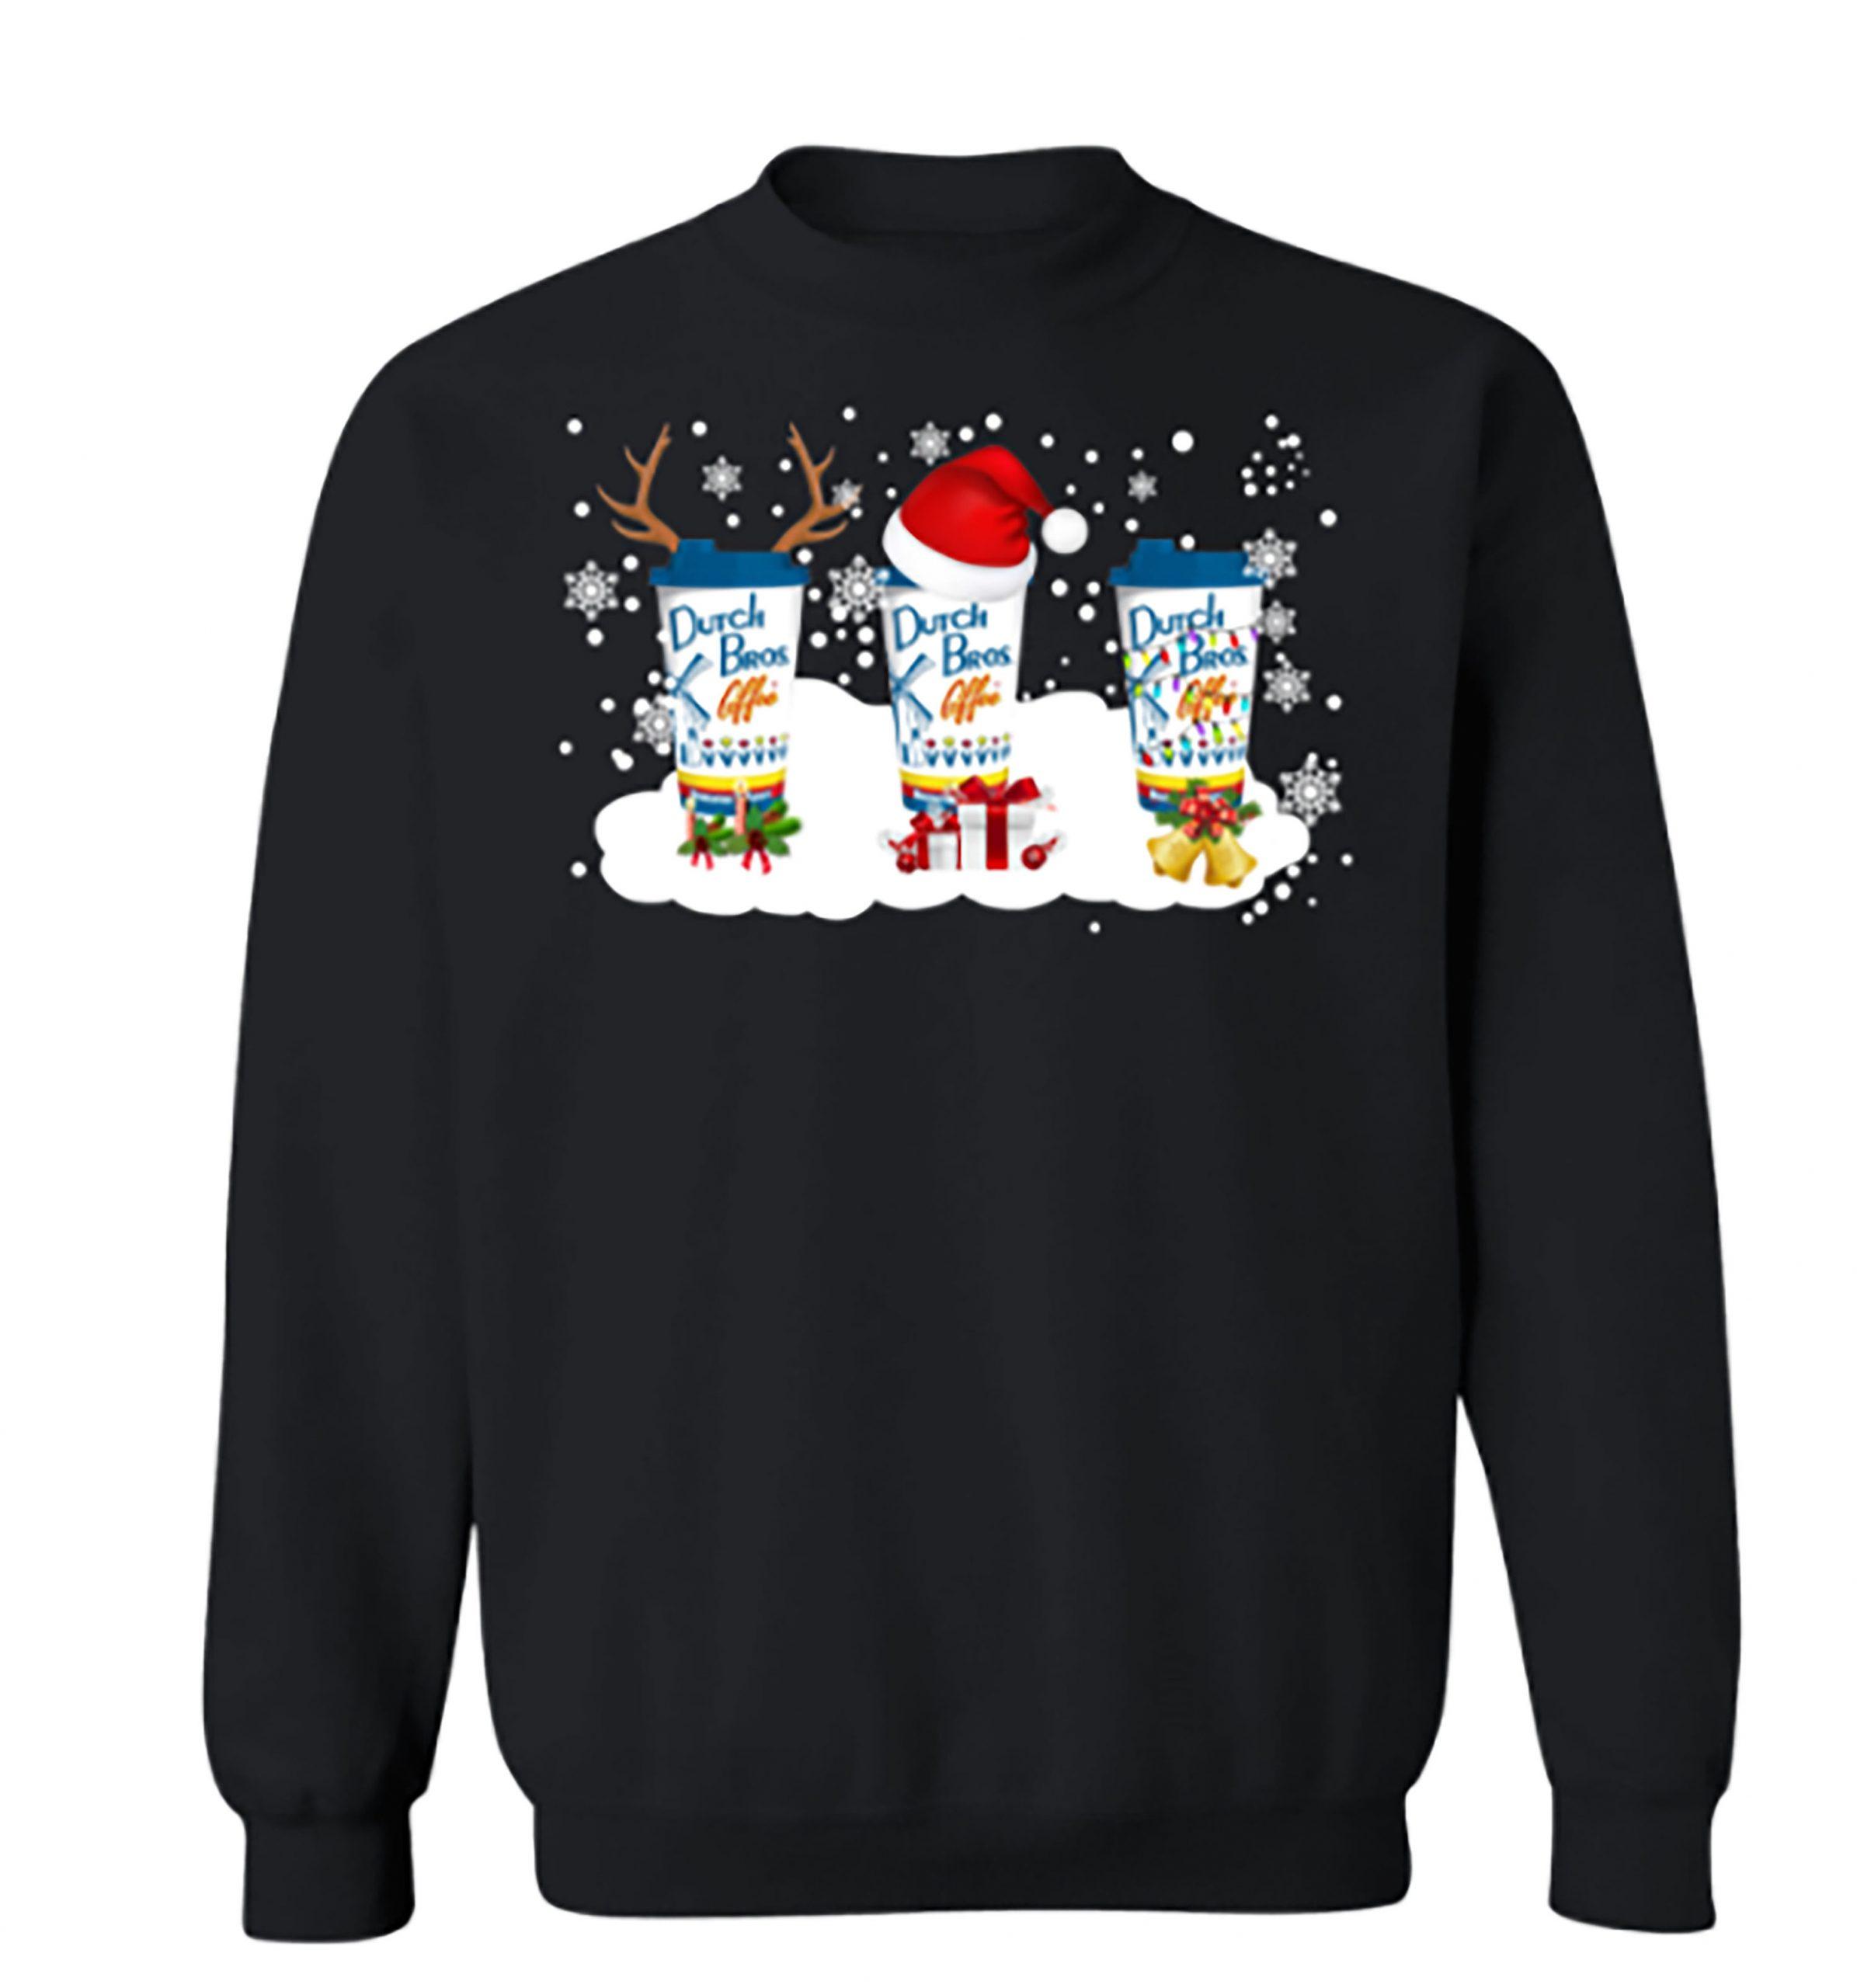 Dutch Bros Coffee Christmas Sweater Shirt